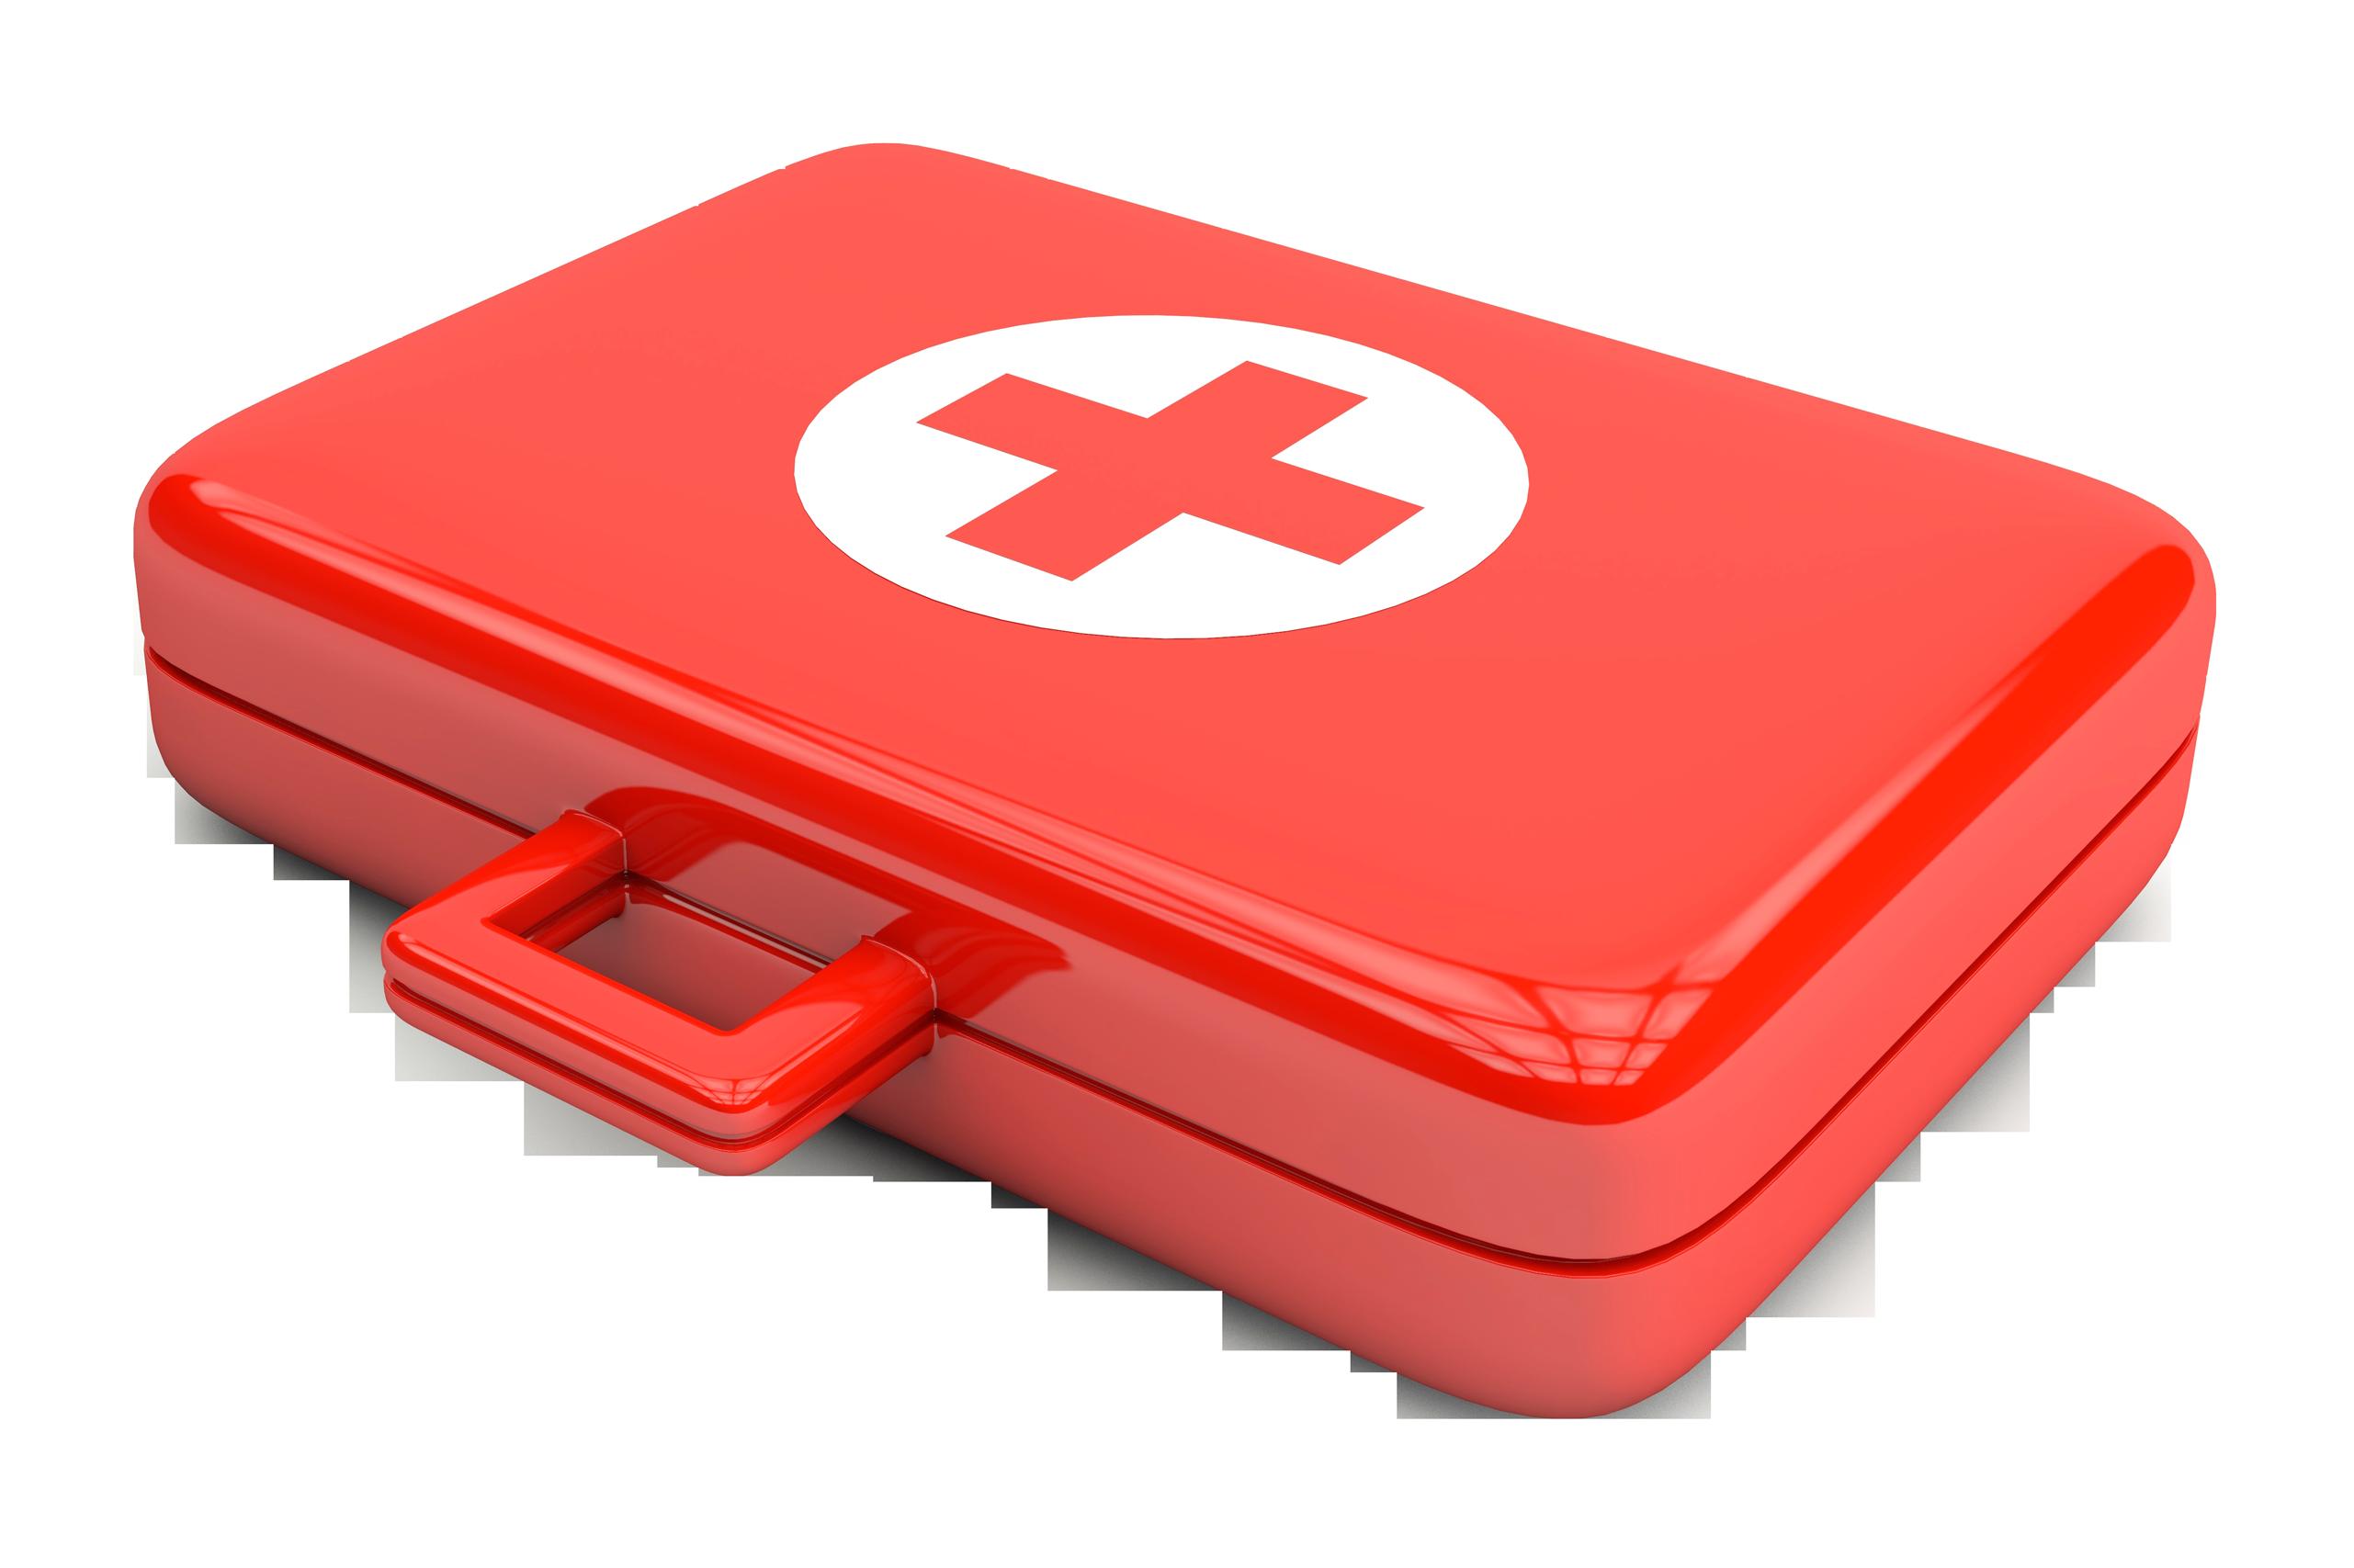 first aid kit for eye exam emergencies